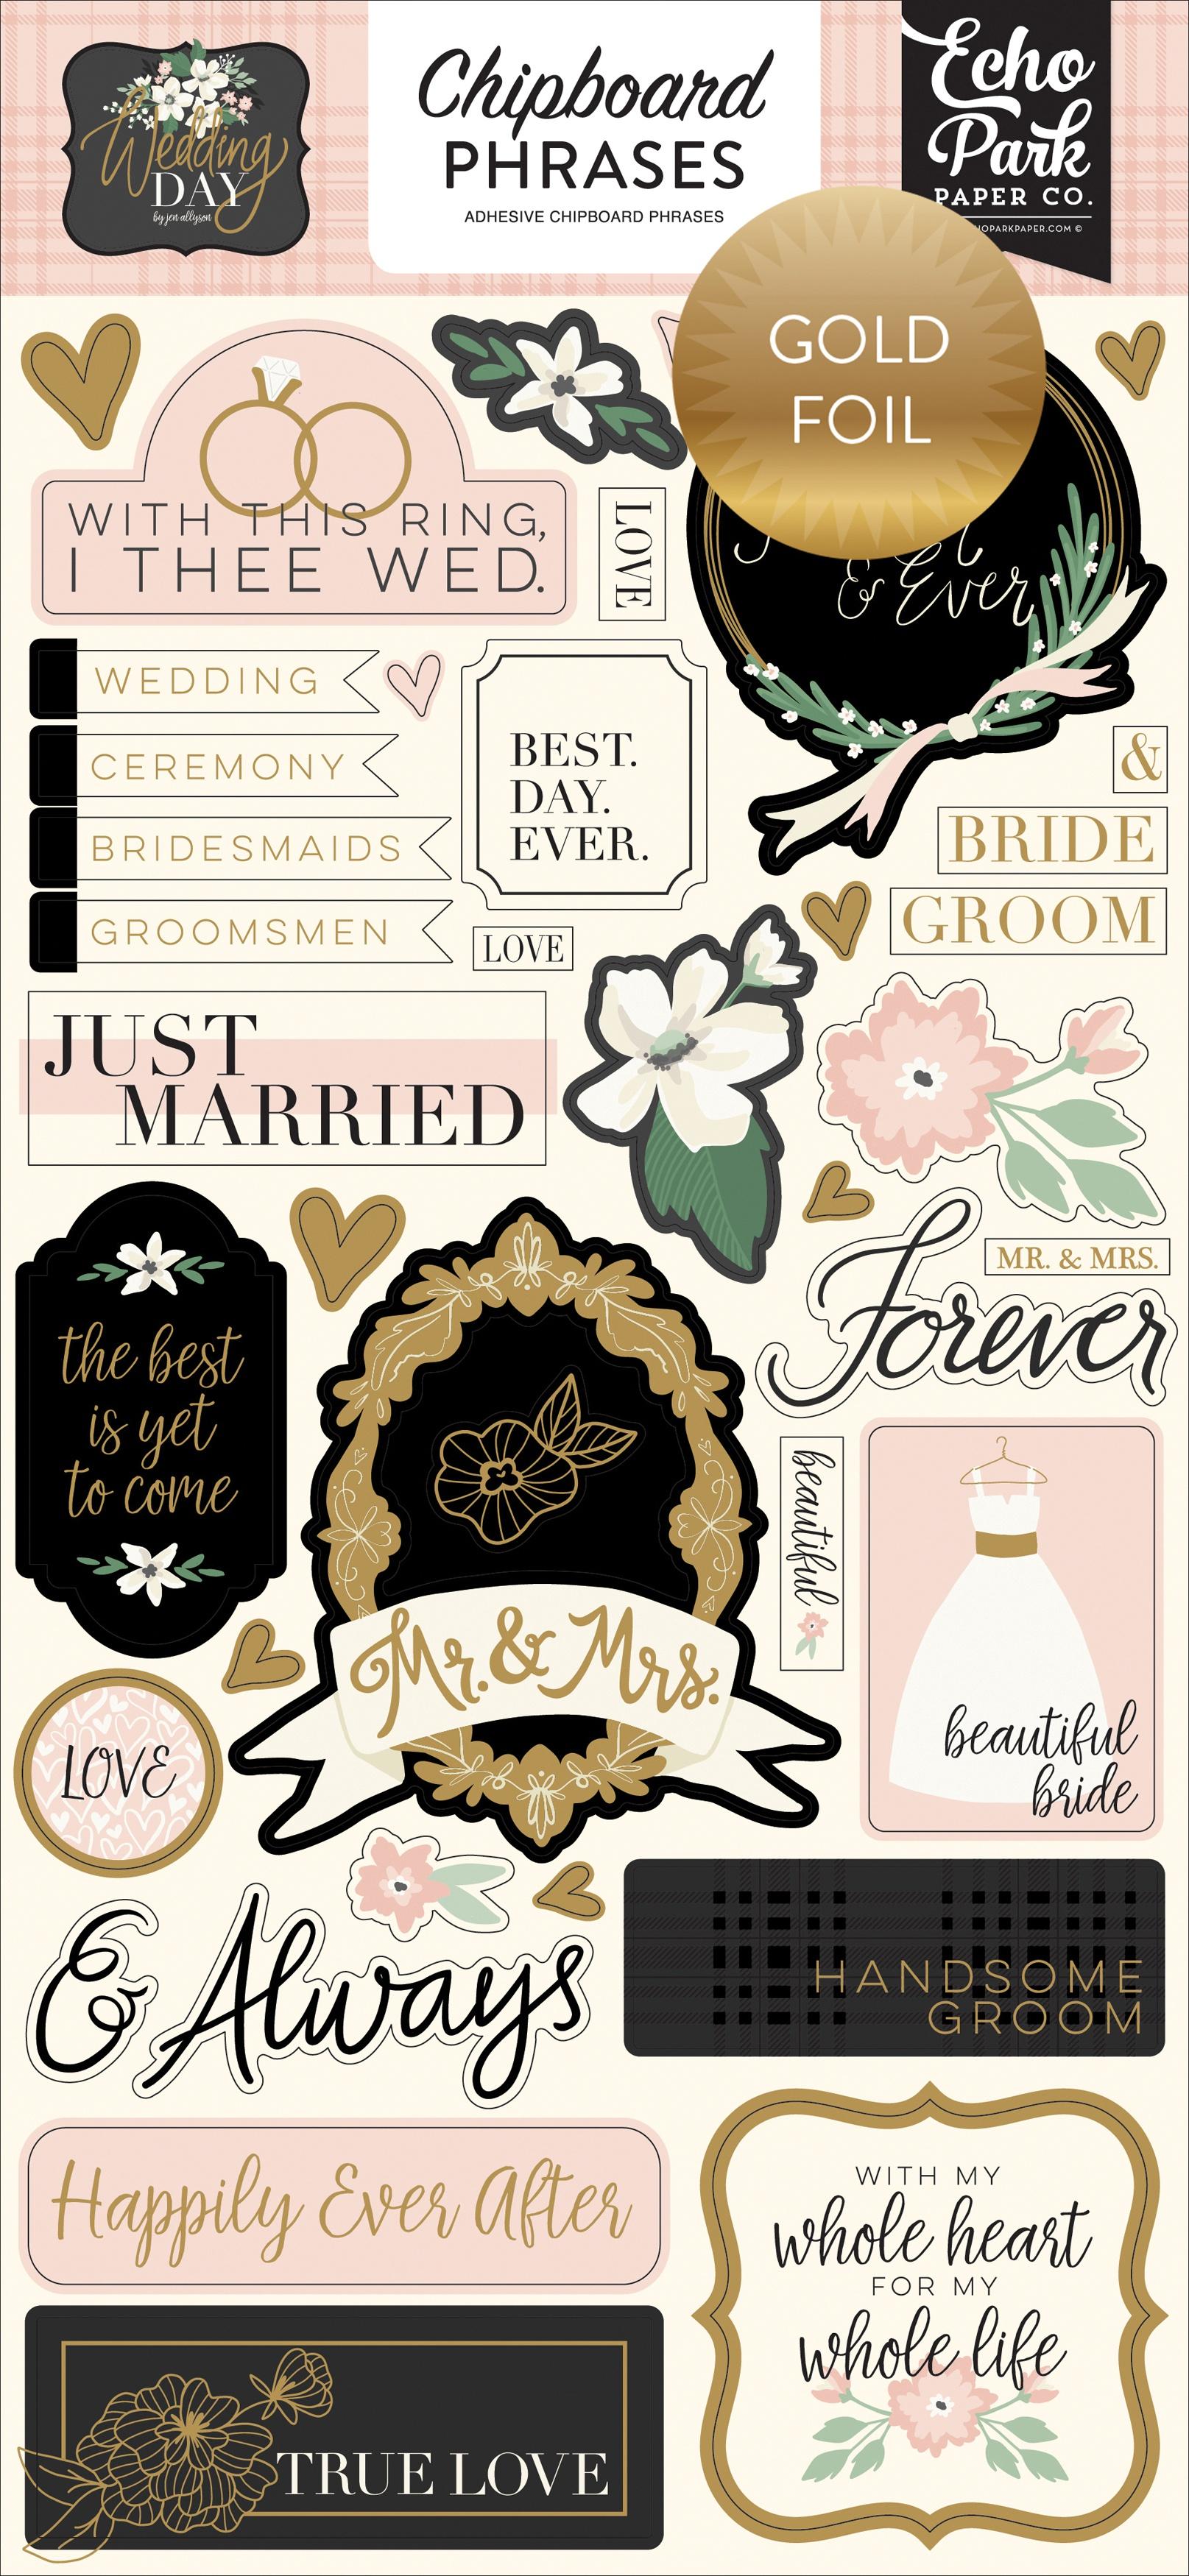 Echo Park Wedding Day Chipboard Phrases